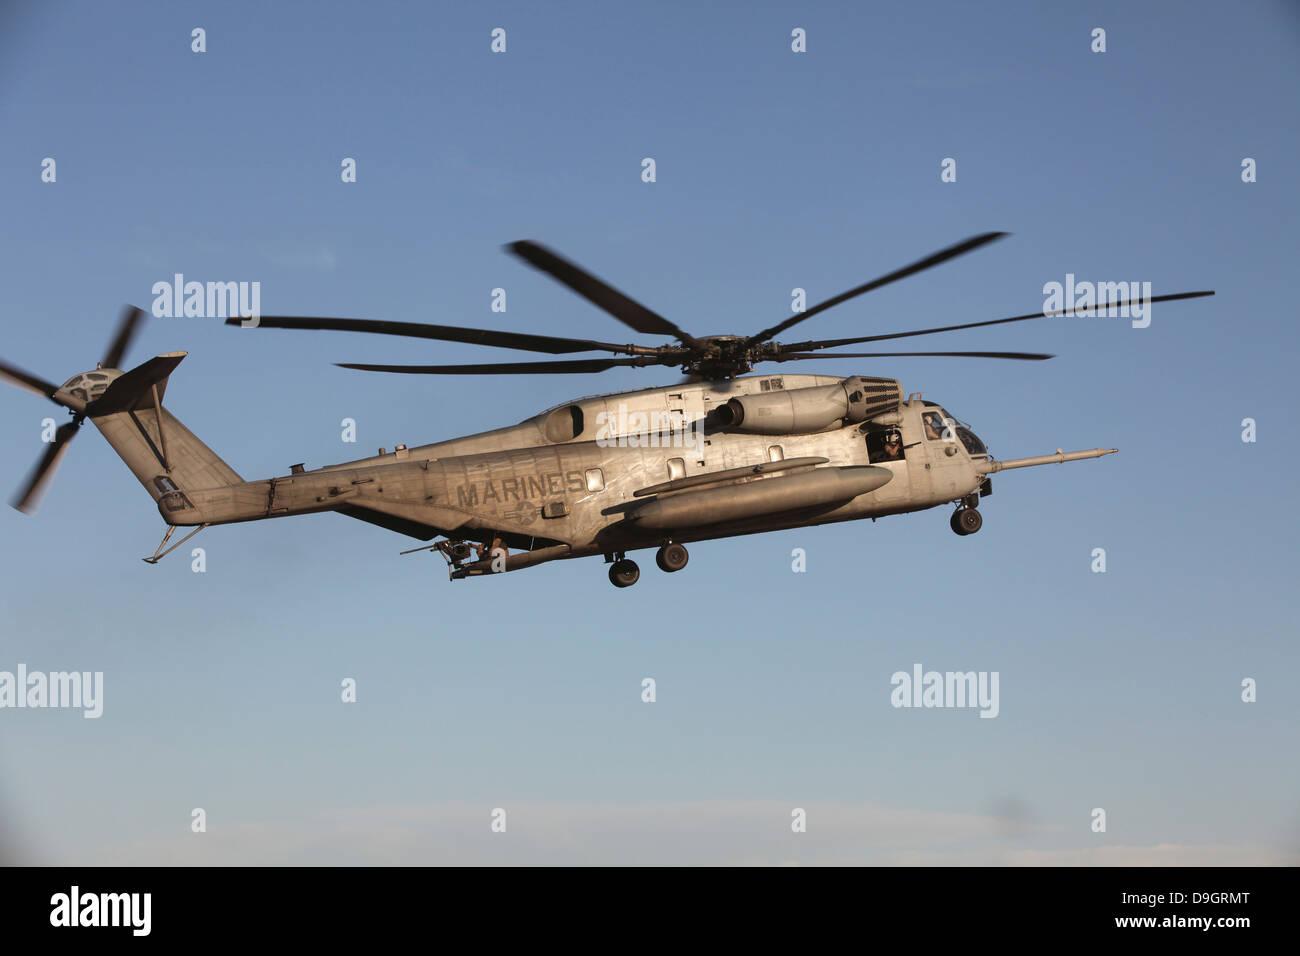 A U.S. Marine Corps CH-53 Sea Stallion helicopter. Stock Photo